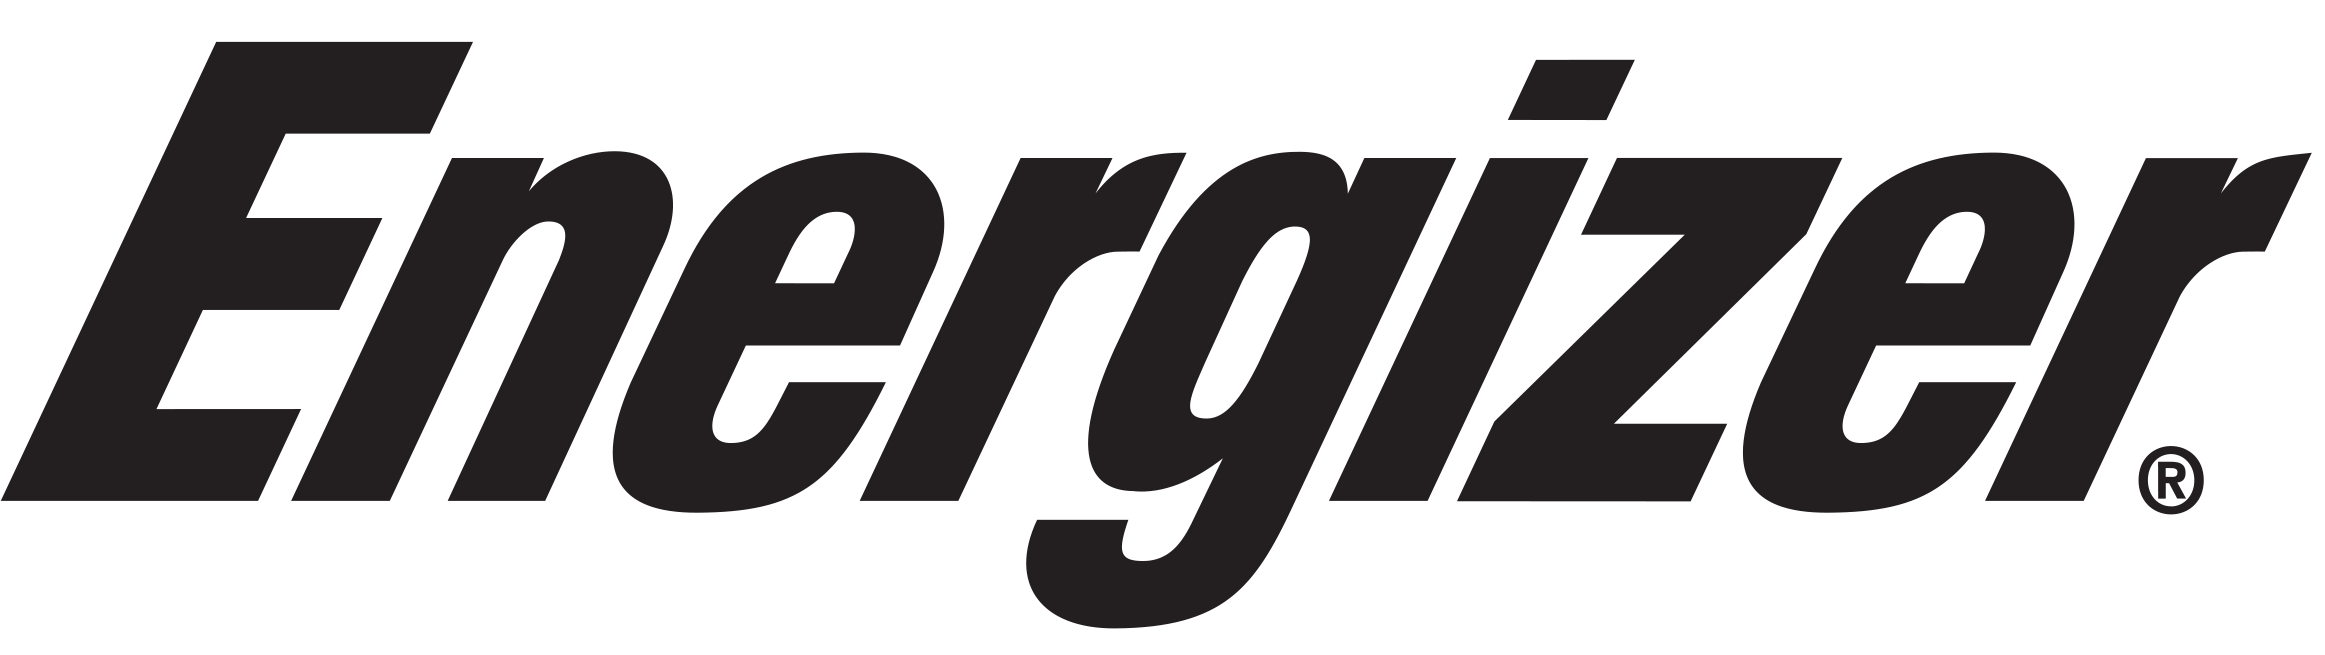 Energizer_logo 1